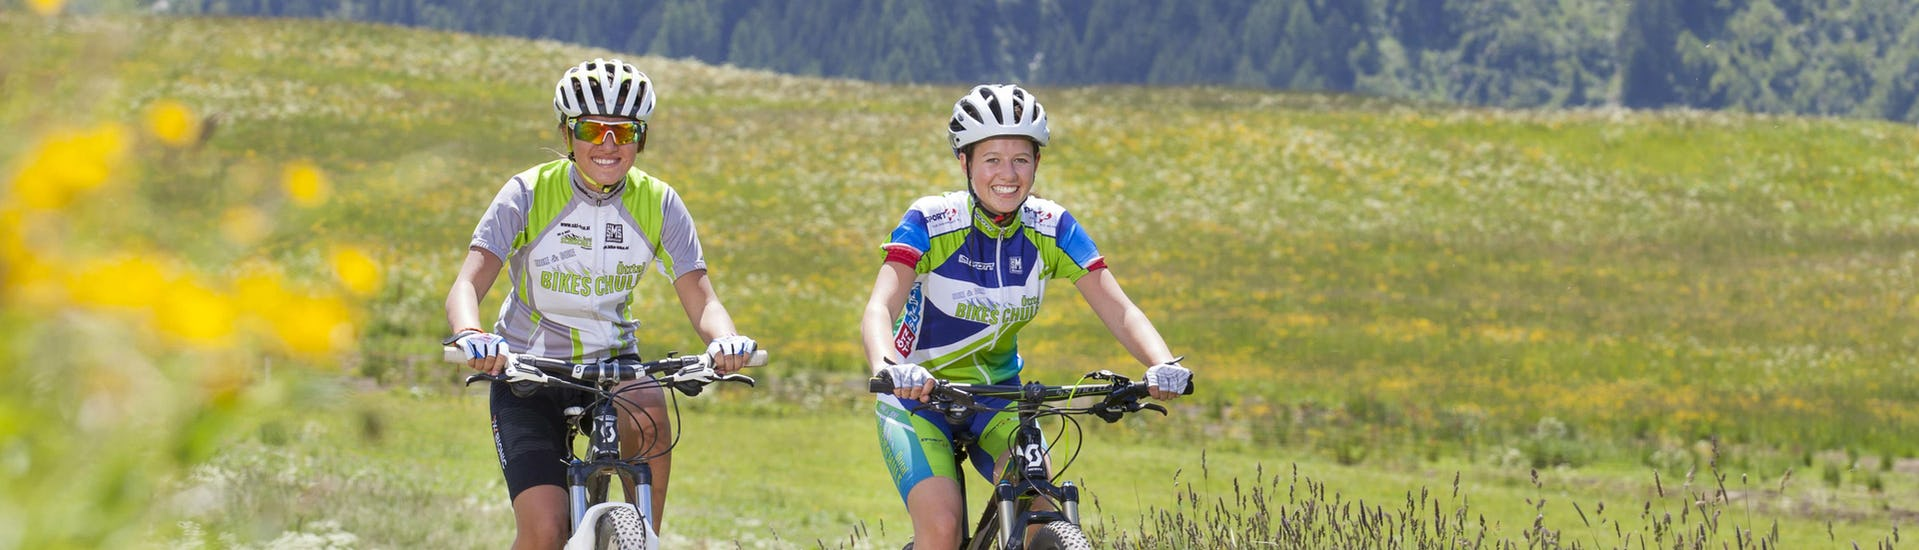 Mountain Bike Training - Advanced